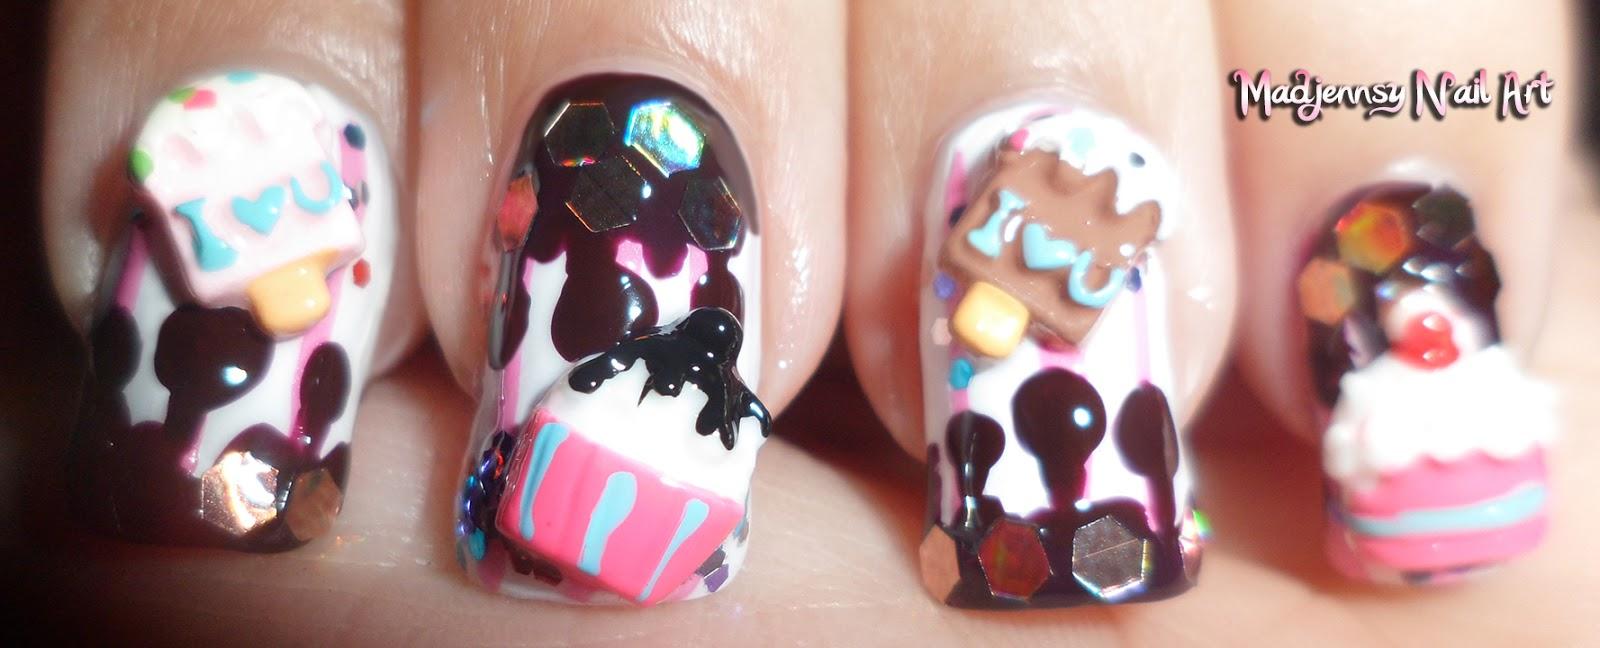 3d Nail Art » 3d Nail Art Nyc - Pictures of Nail Art Design Ideas